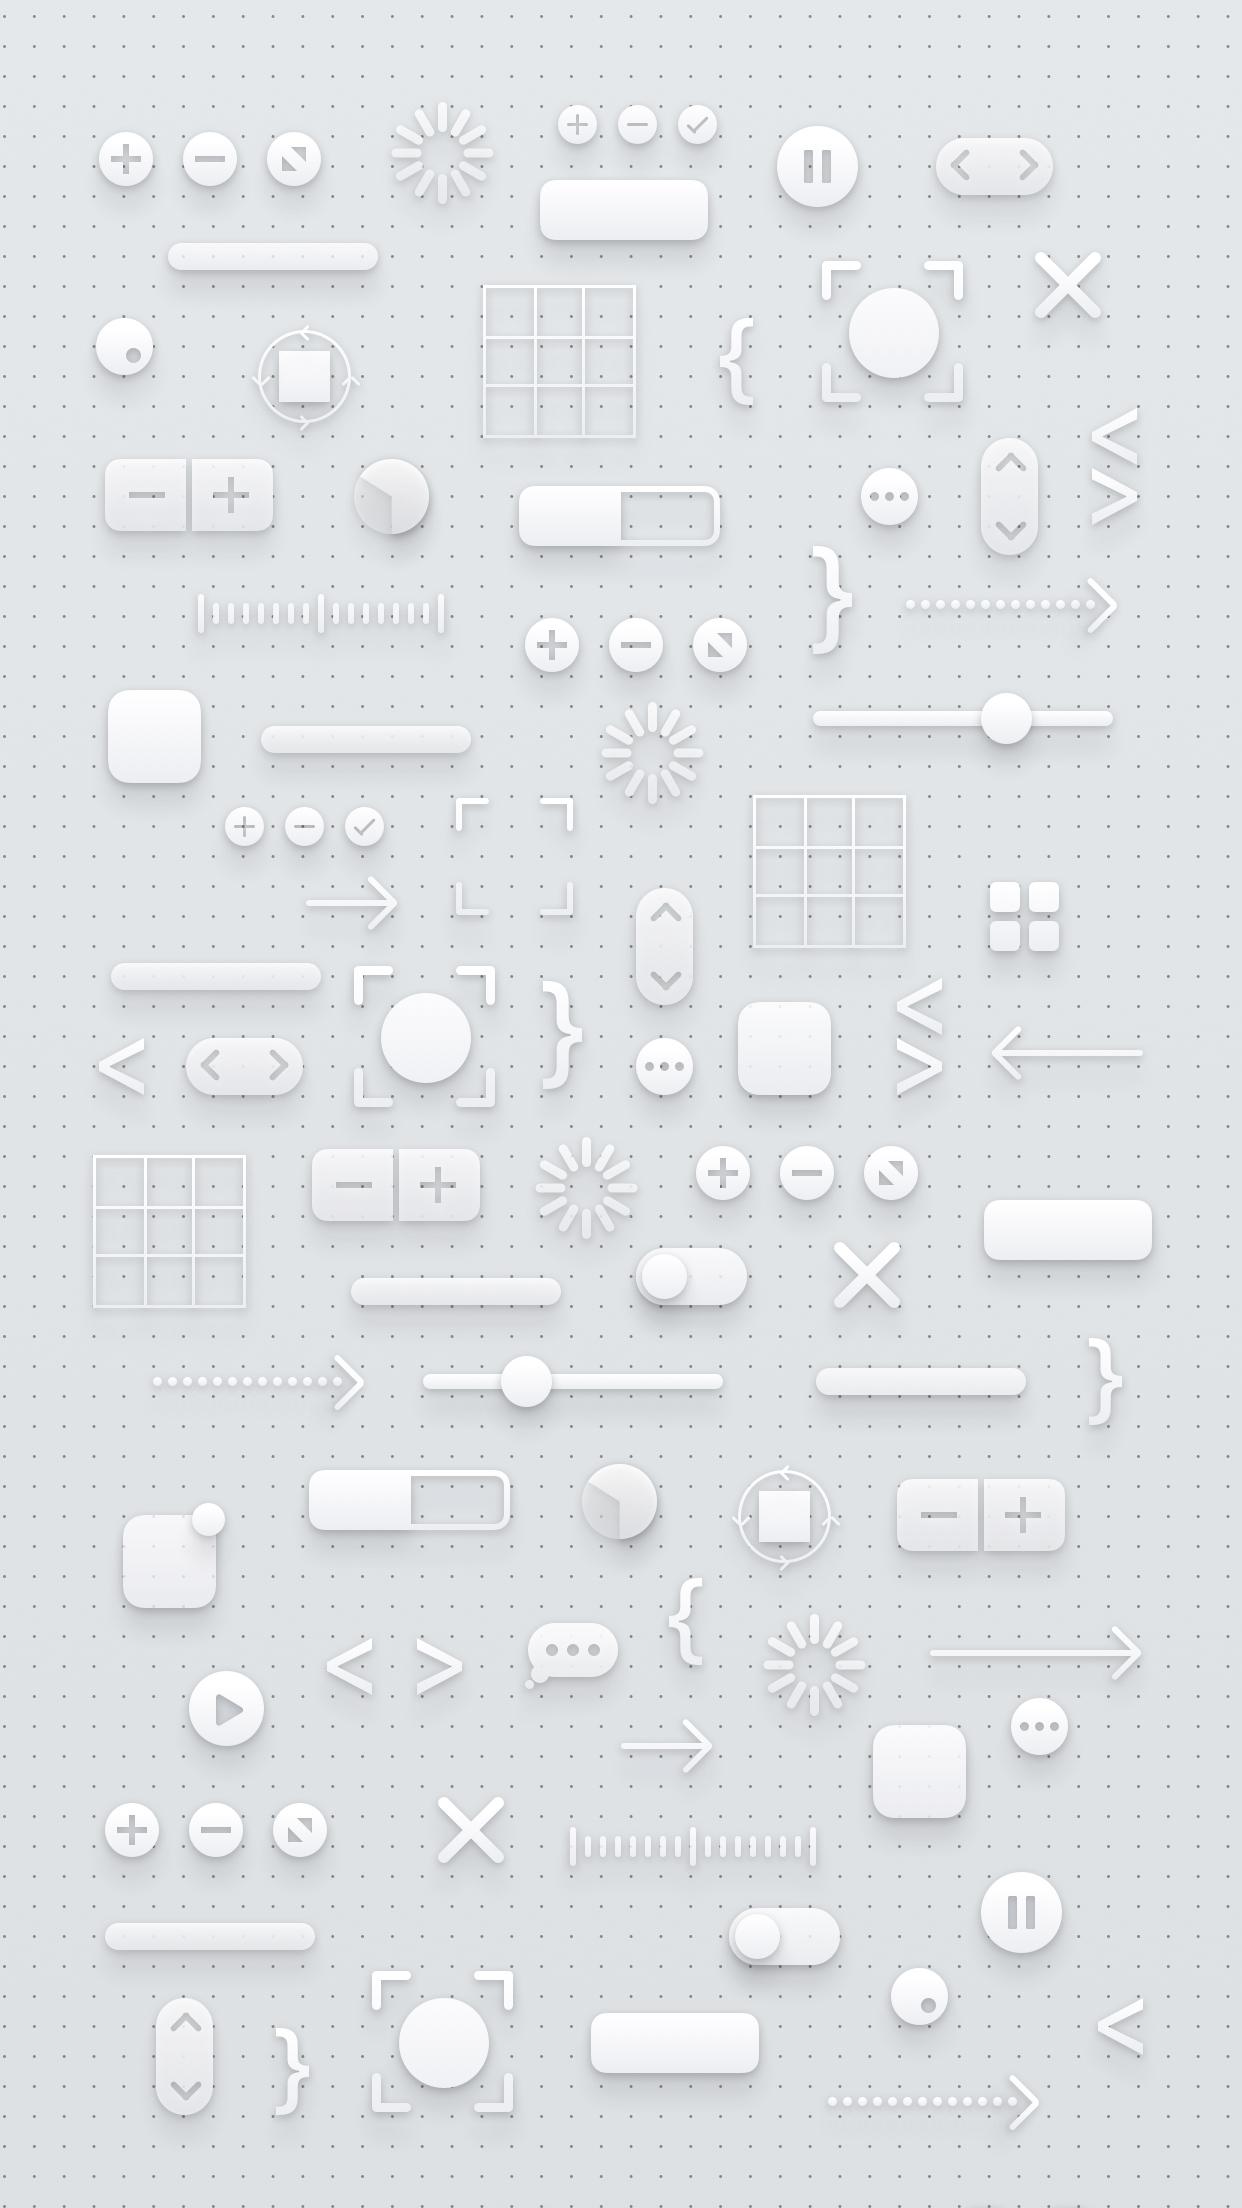 Apple Iphone X Wallpaper แจกภาพพื้นหลัง Wallpaper ชุด Wwdc18 สำหรับ Iphone